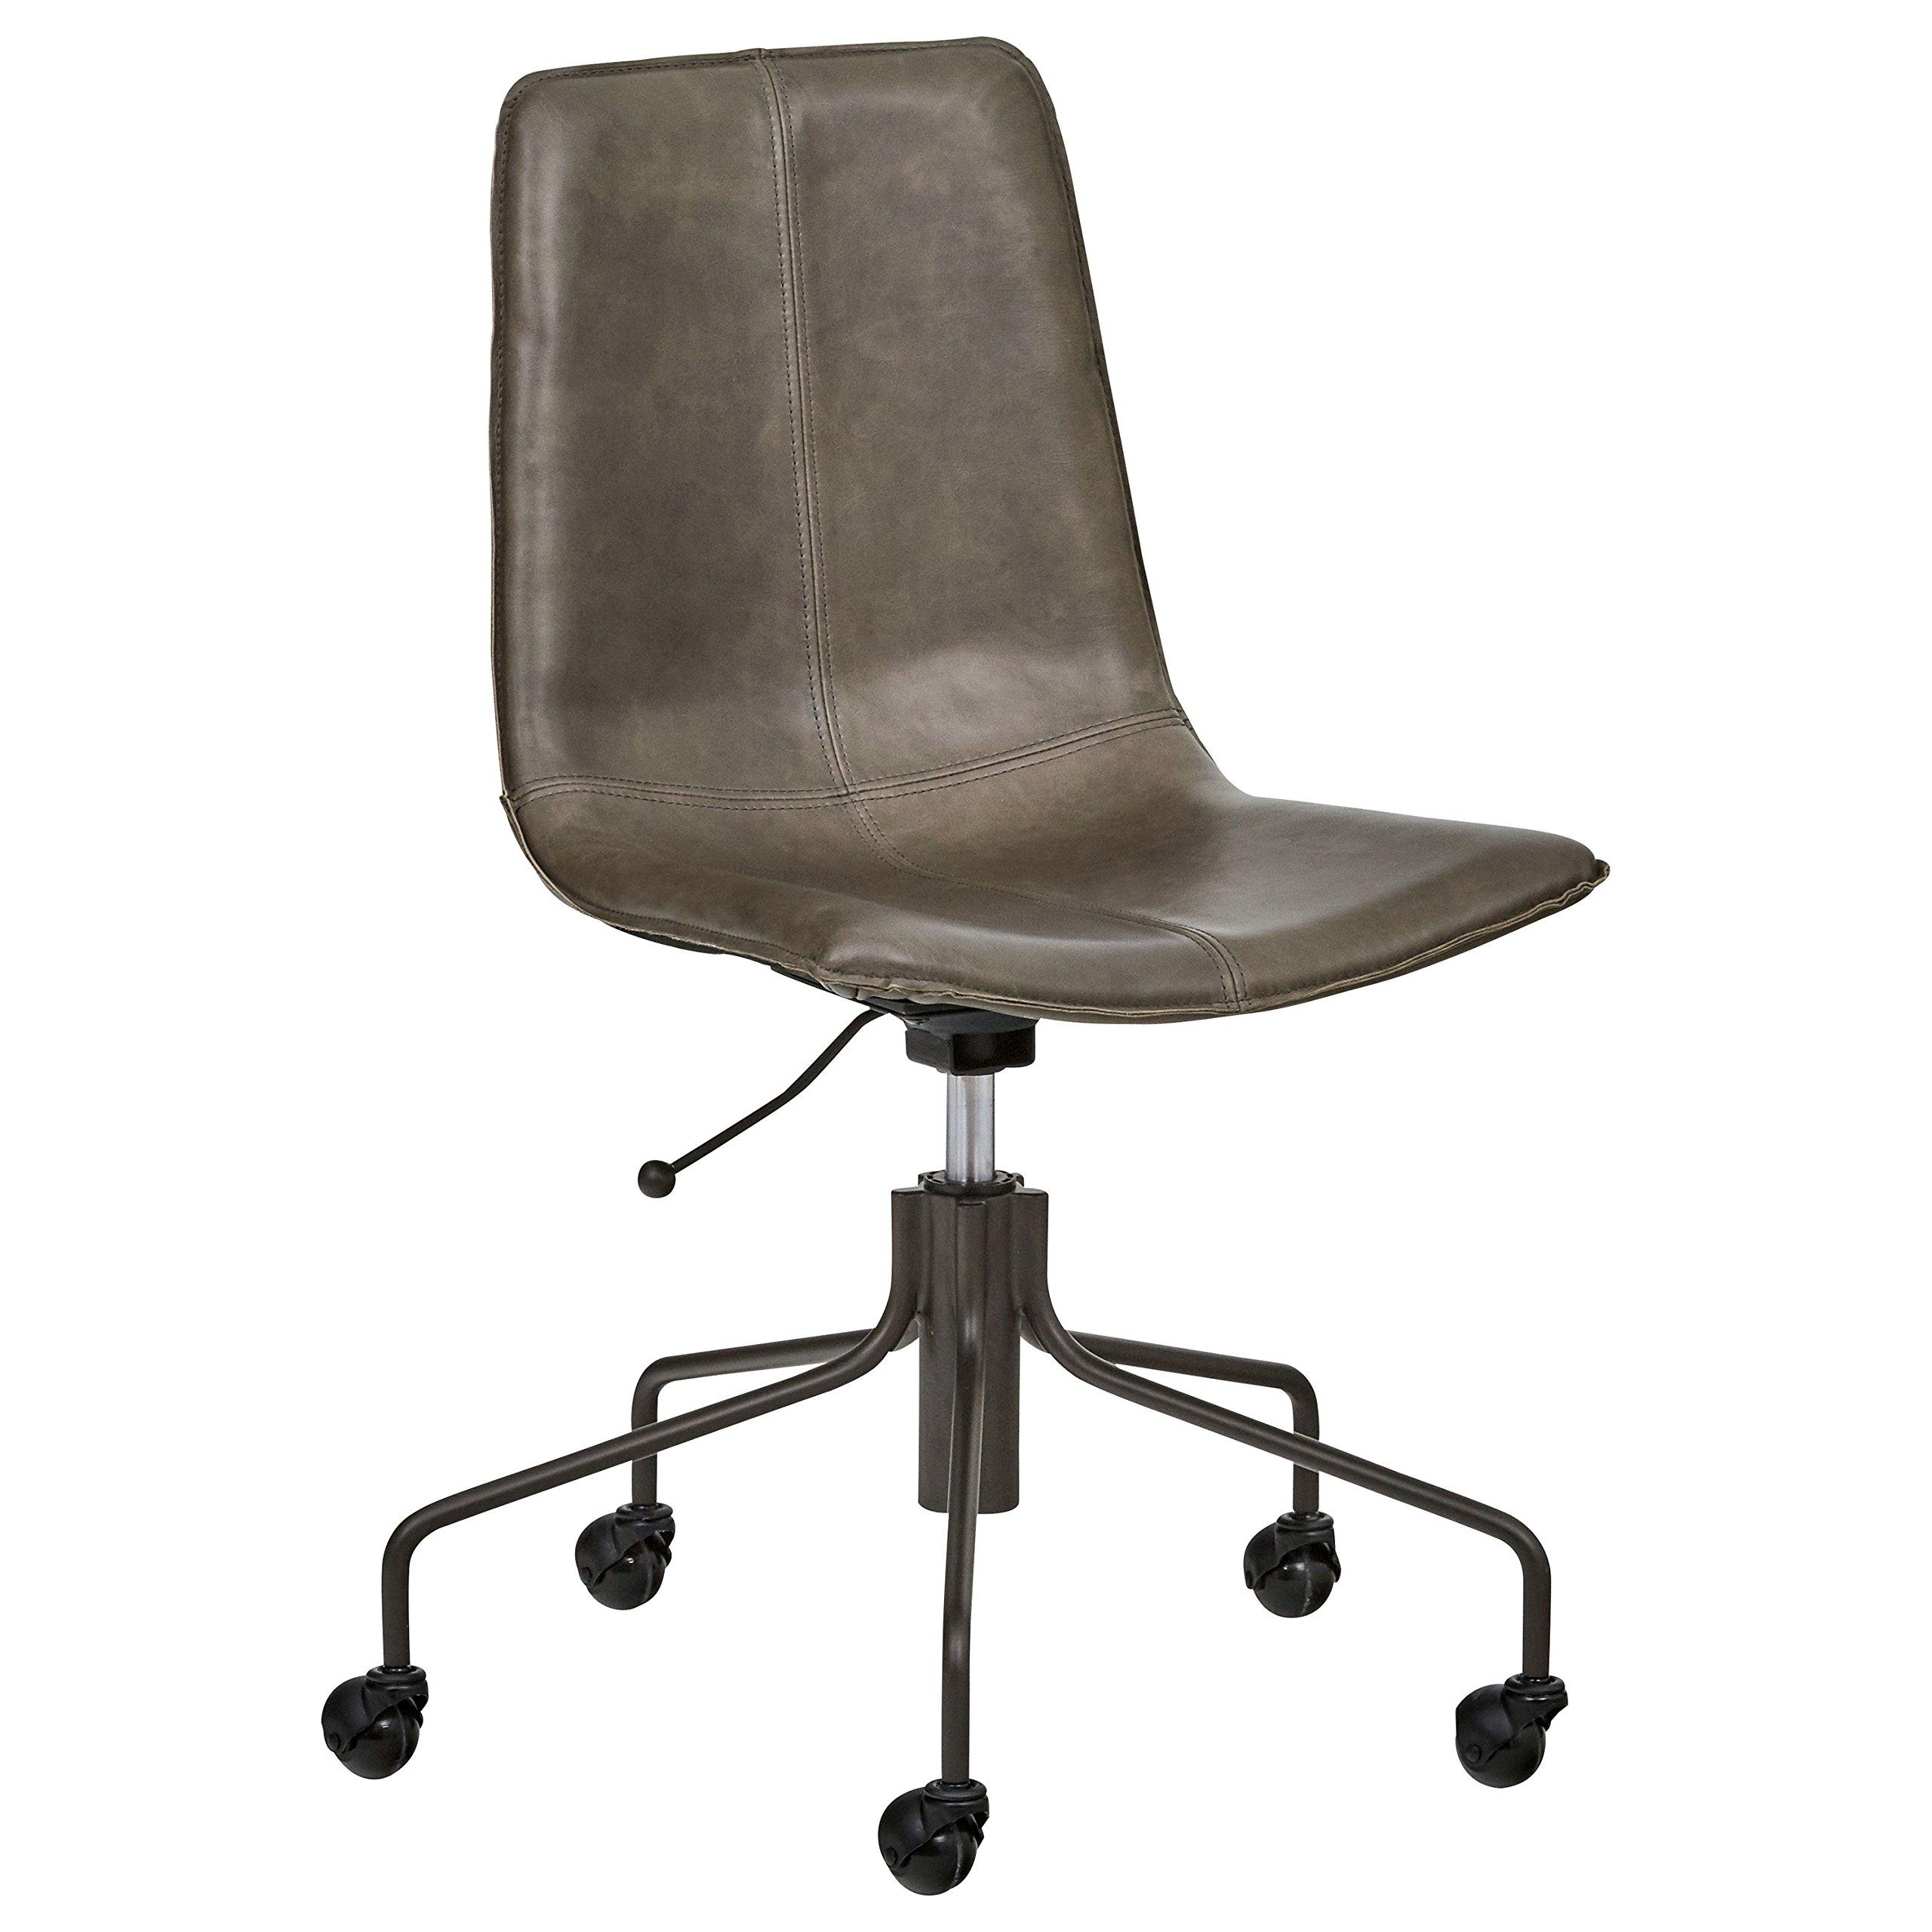 Rivet Industrial Slope Top-Grain Leather Swivel Office Chair, 24.41'' W, Grey Fog